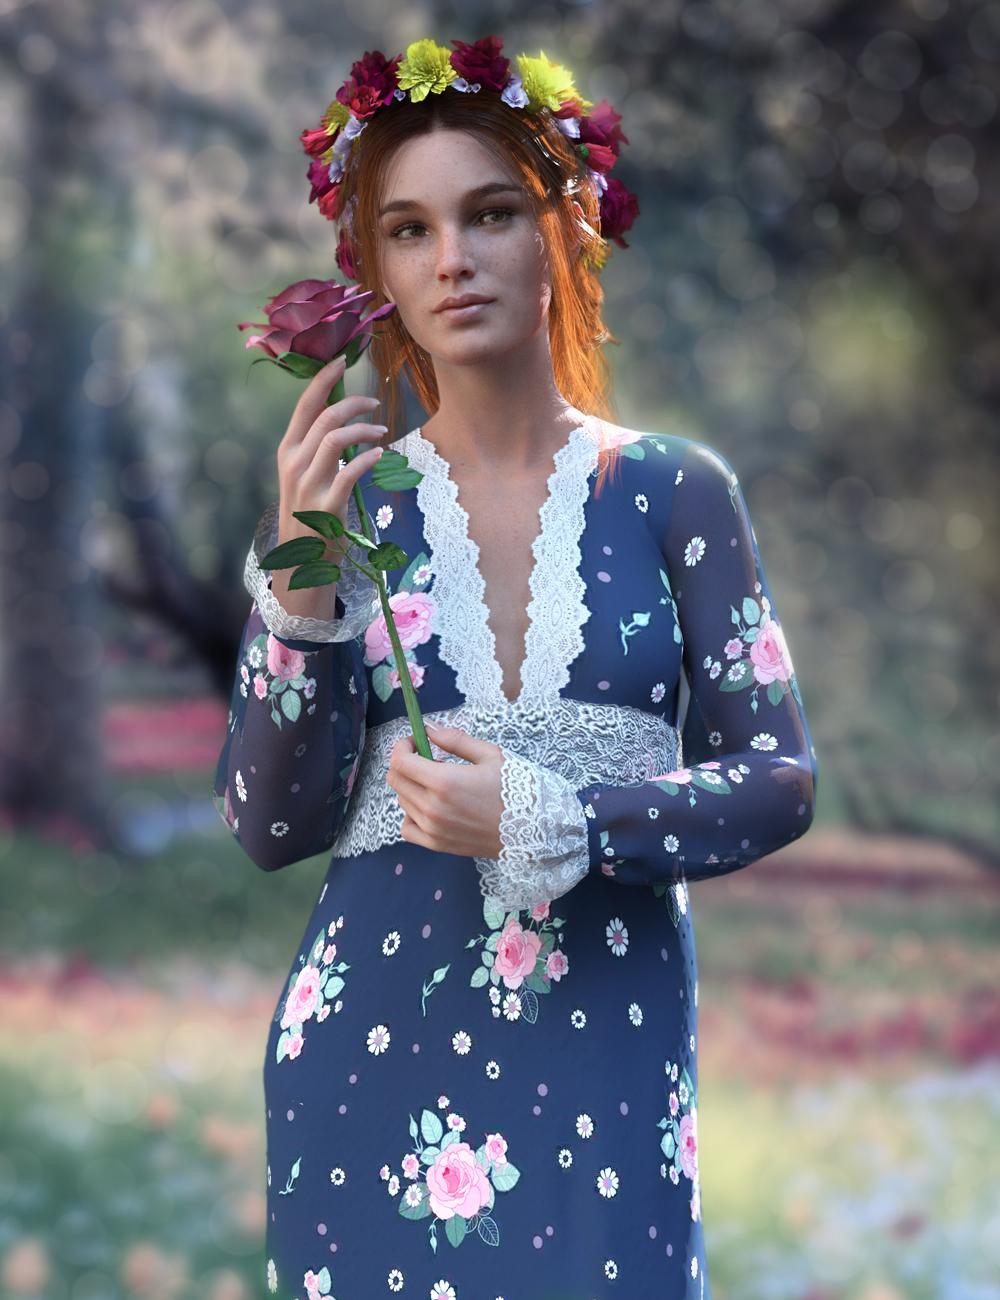 dForce YesterYear Nightgown Outfit for Genesis 8 Females by: Pixelunashadownet, 3D Models by Daz 3D